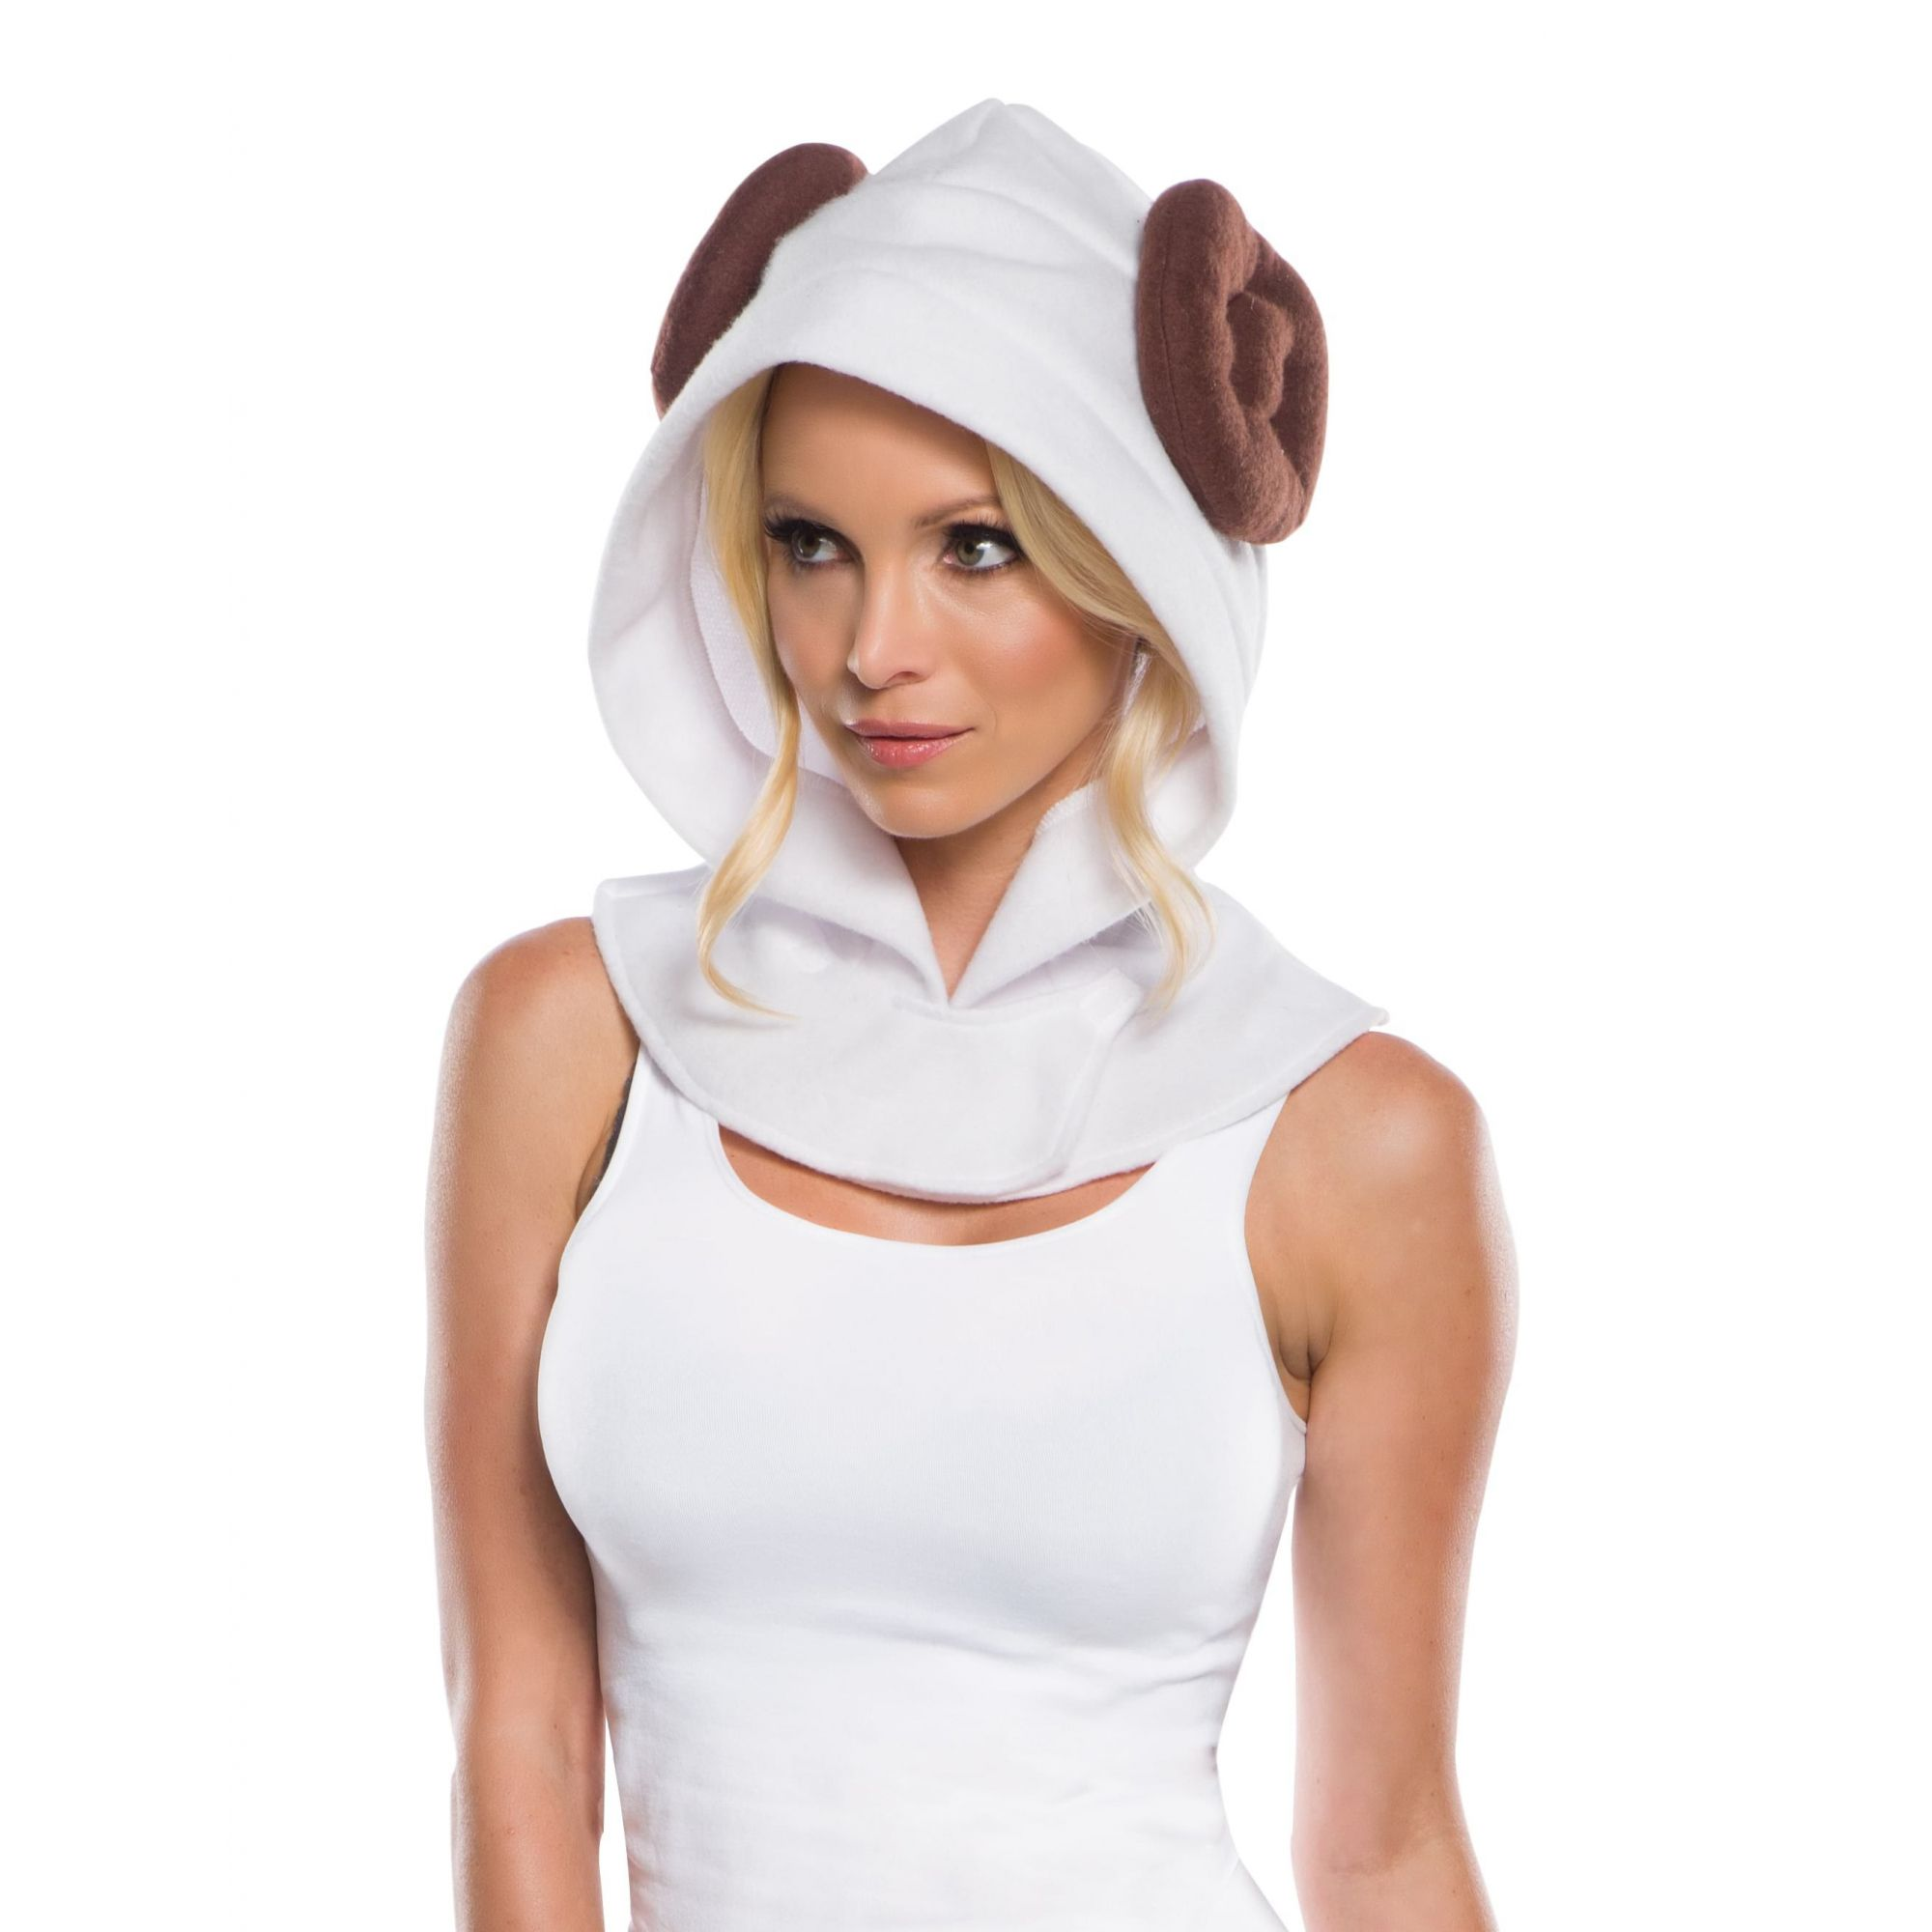 Capuz Princesa Leia: Star Wars (Acessório Fantasia) - Rubies Costume - CD